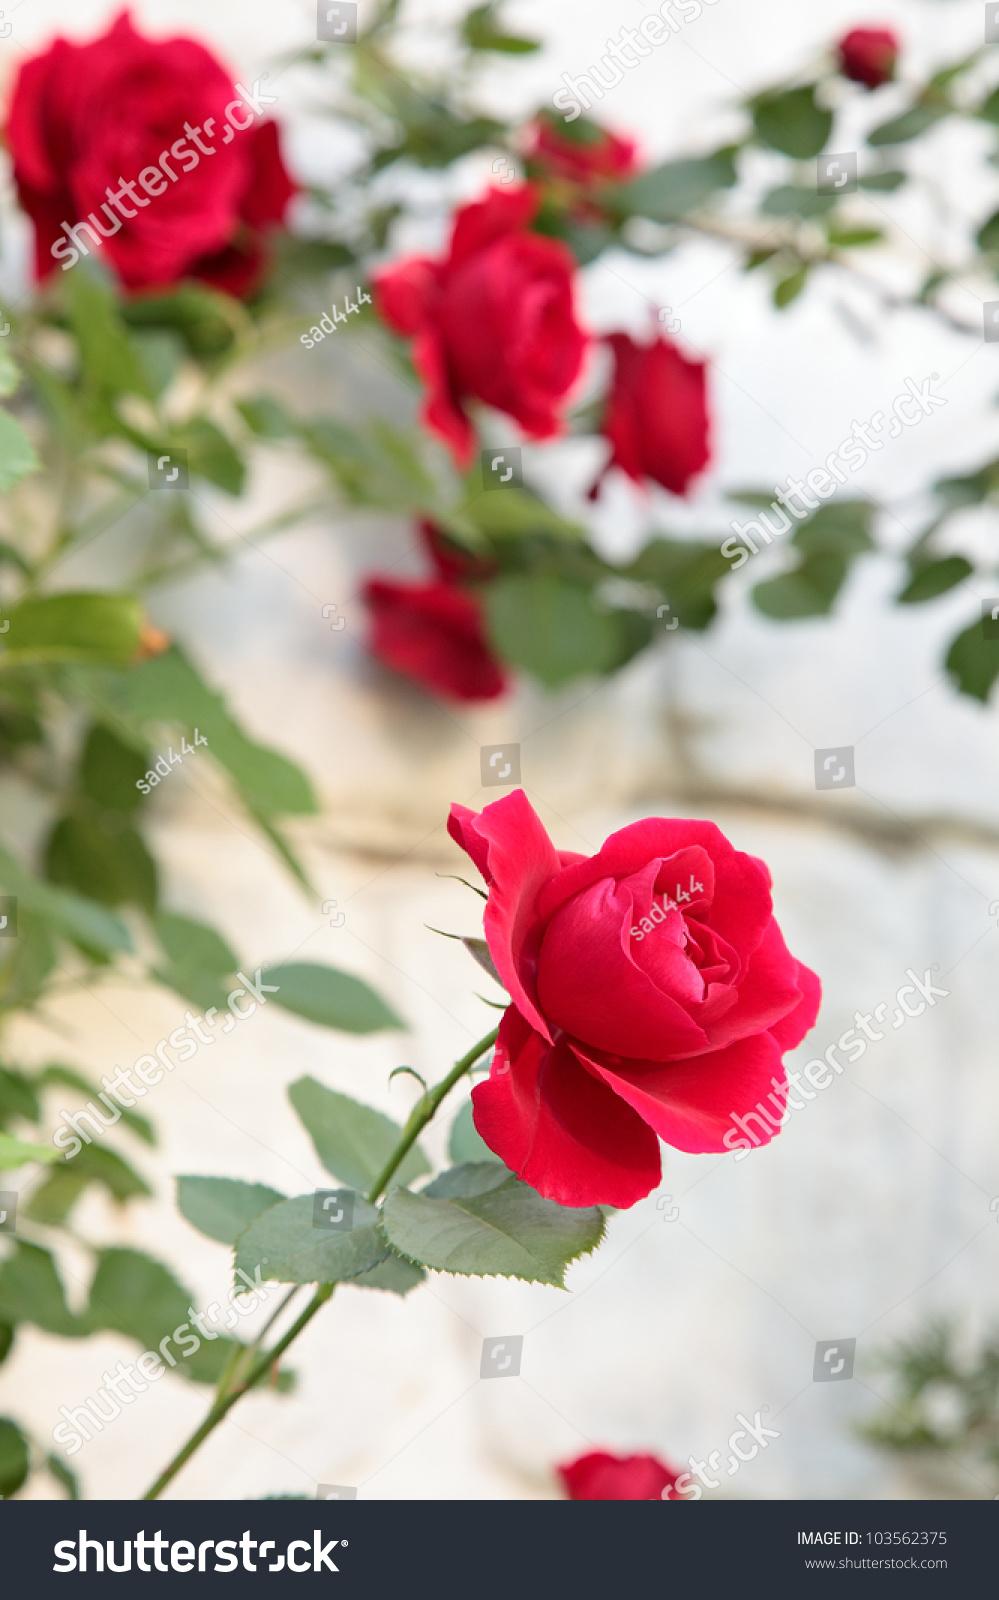 Beautiful flower red rose nature stock photo edit now 103562375 beautiful flower red rose nature izmirmasajfo